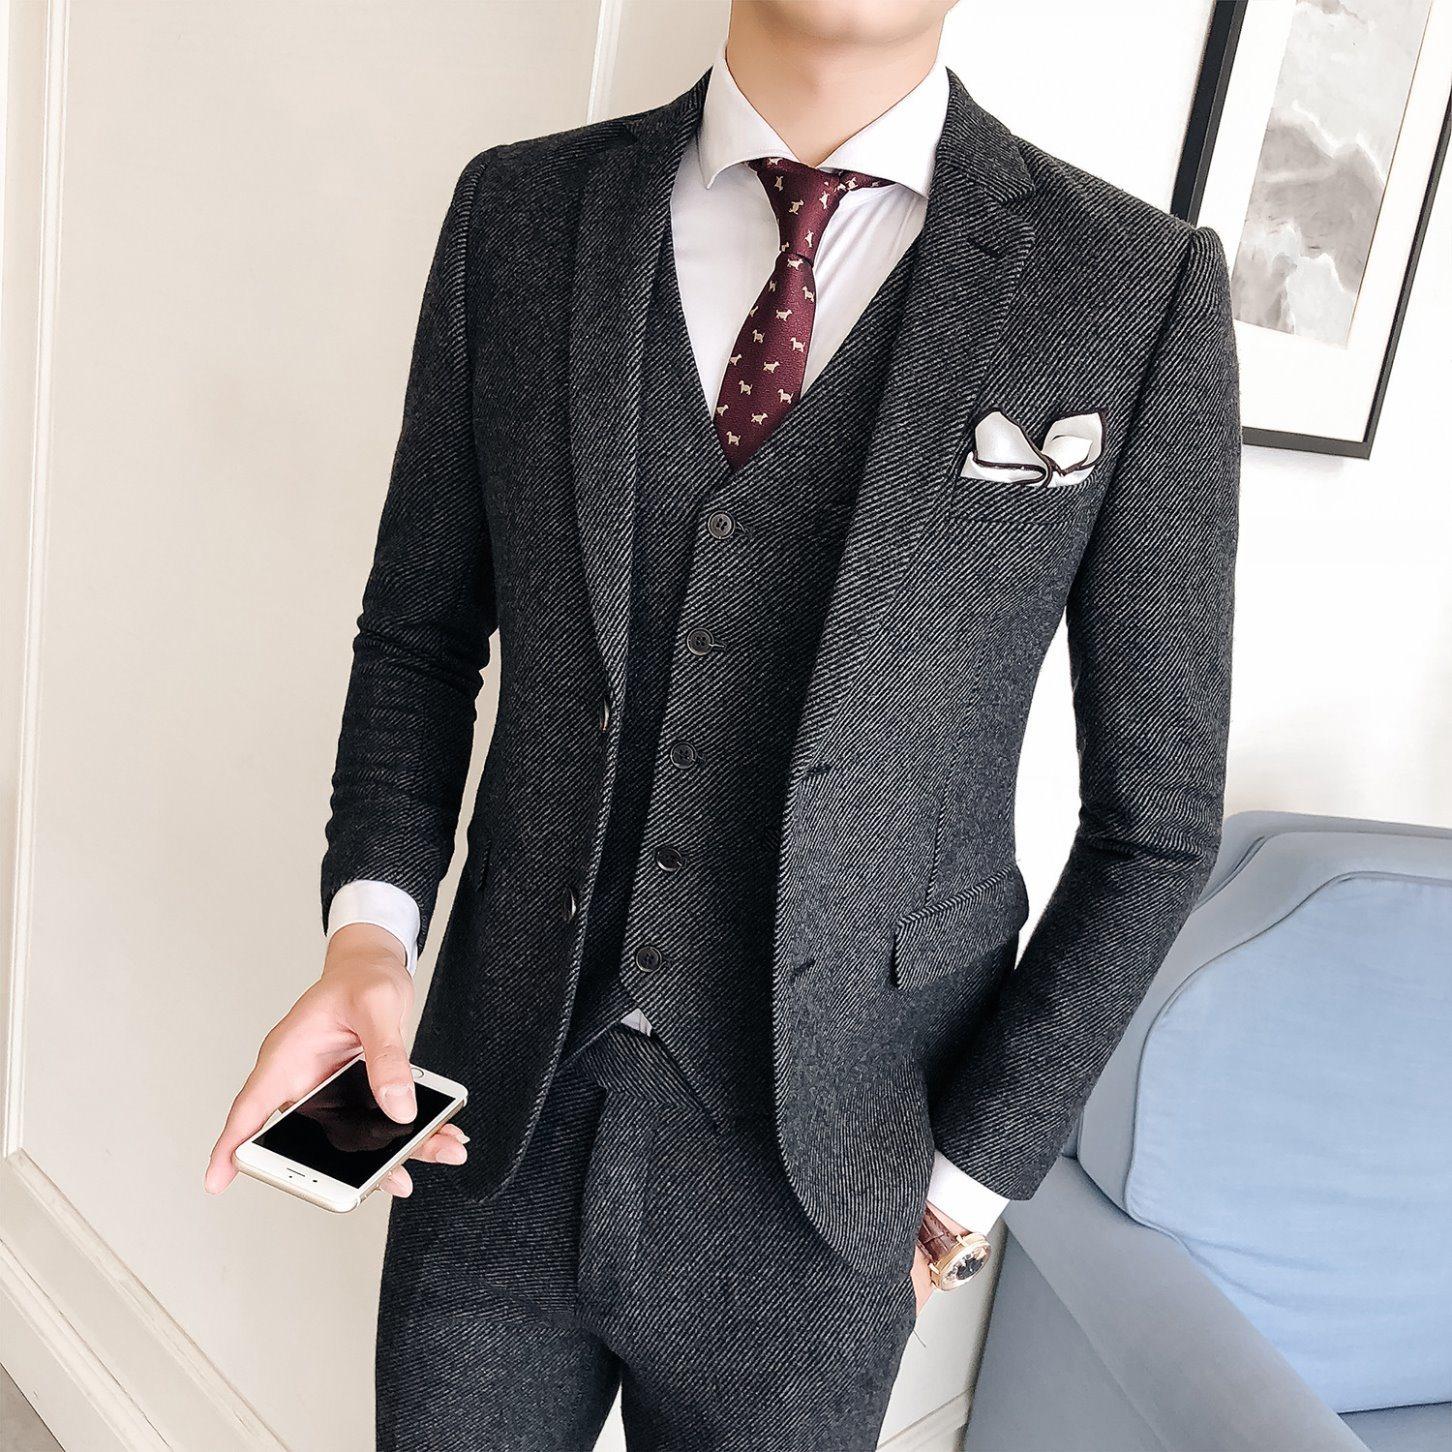 men's apparel business